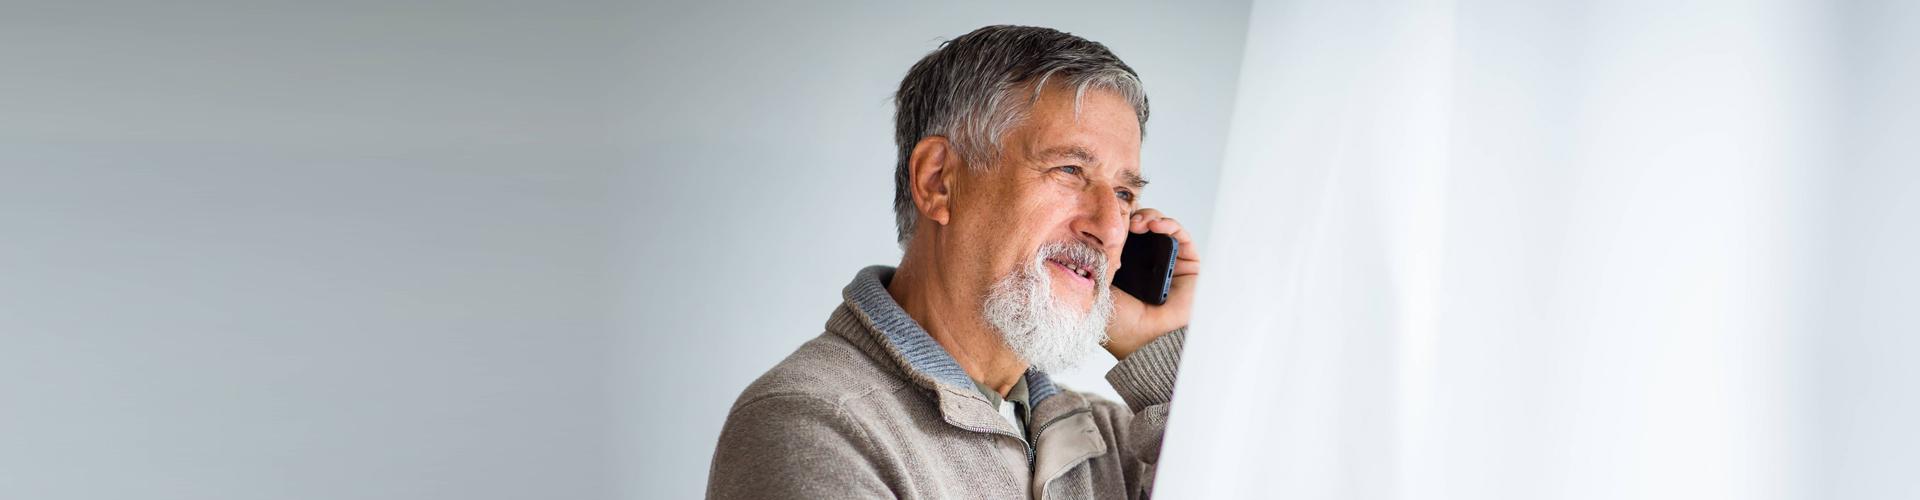 senior man having a phone call